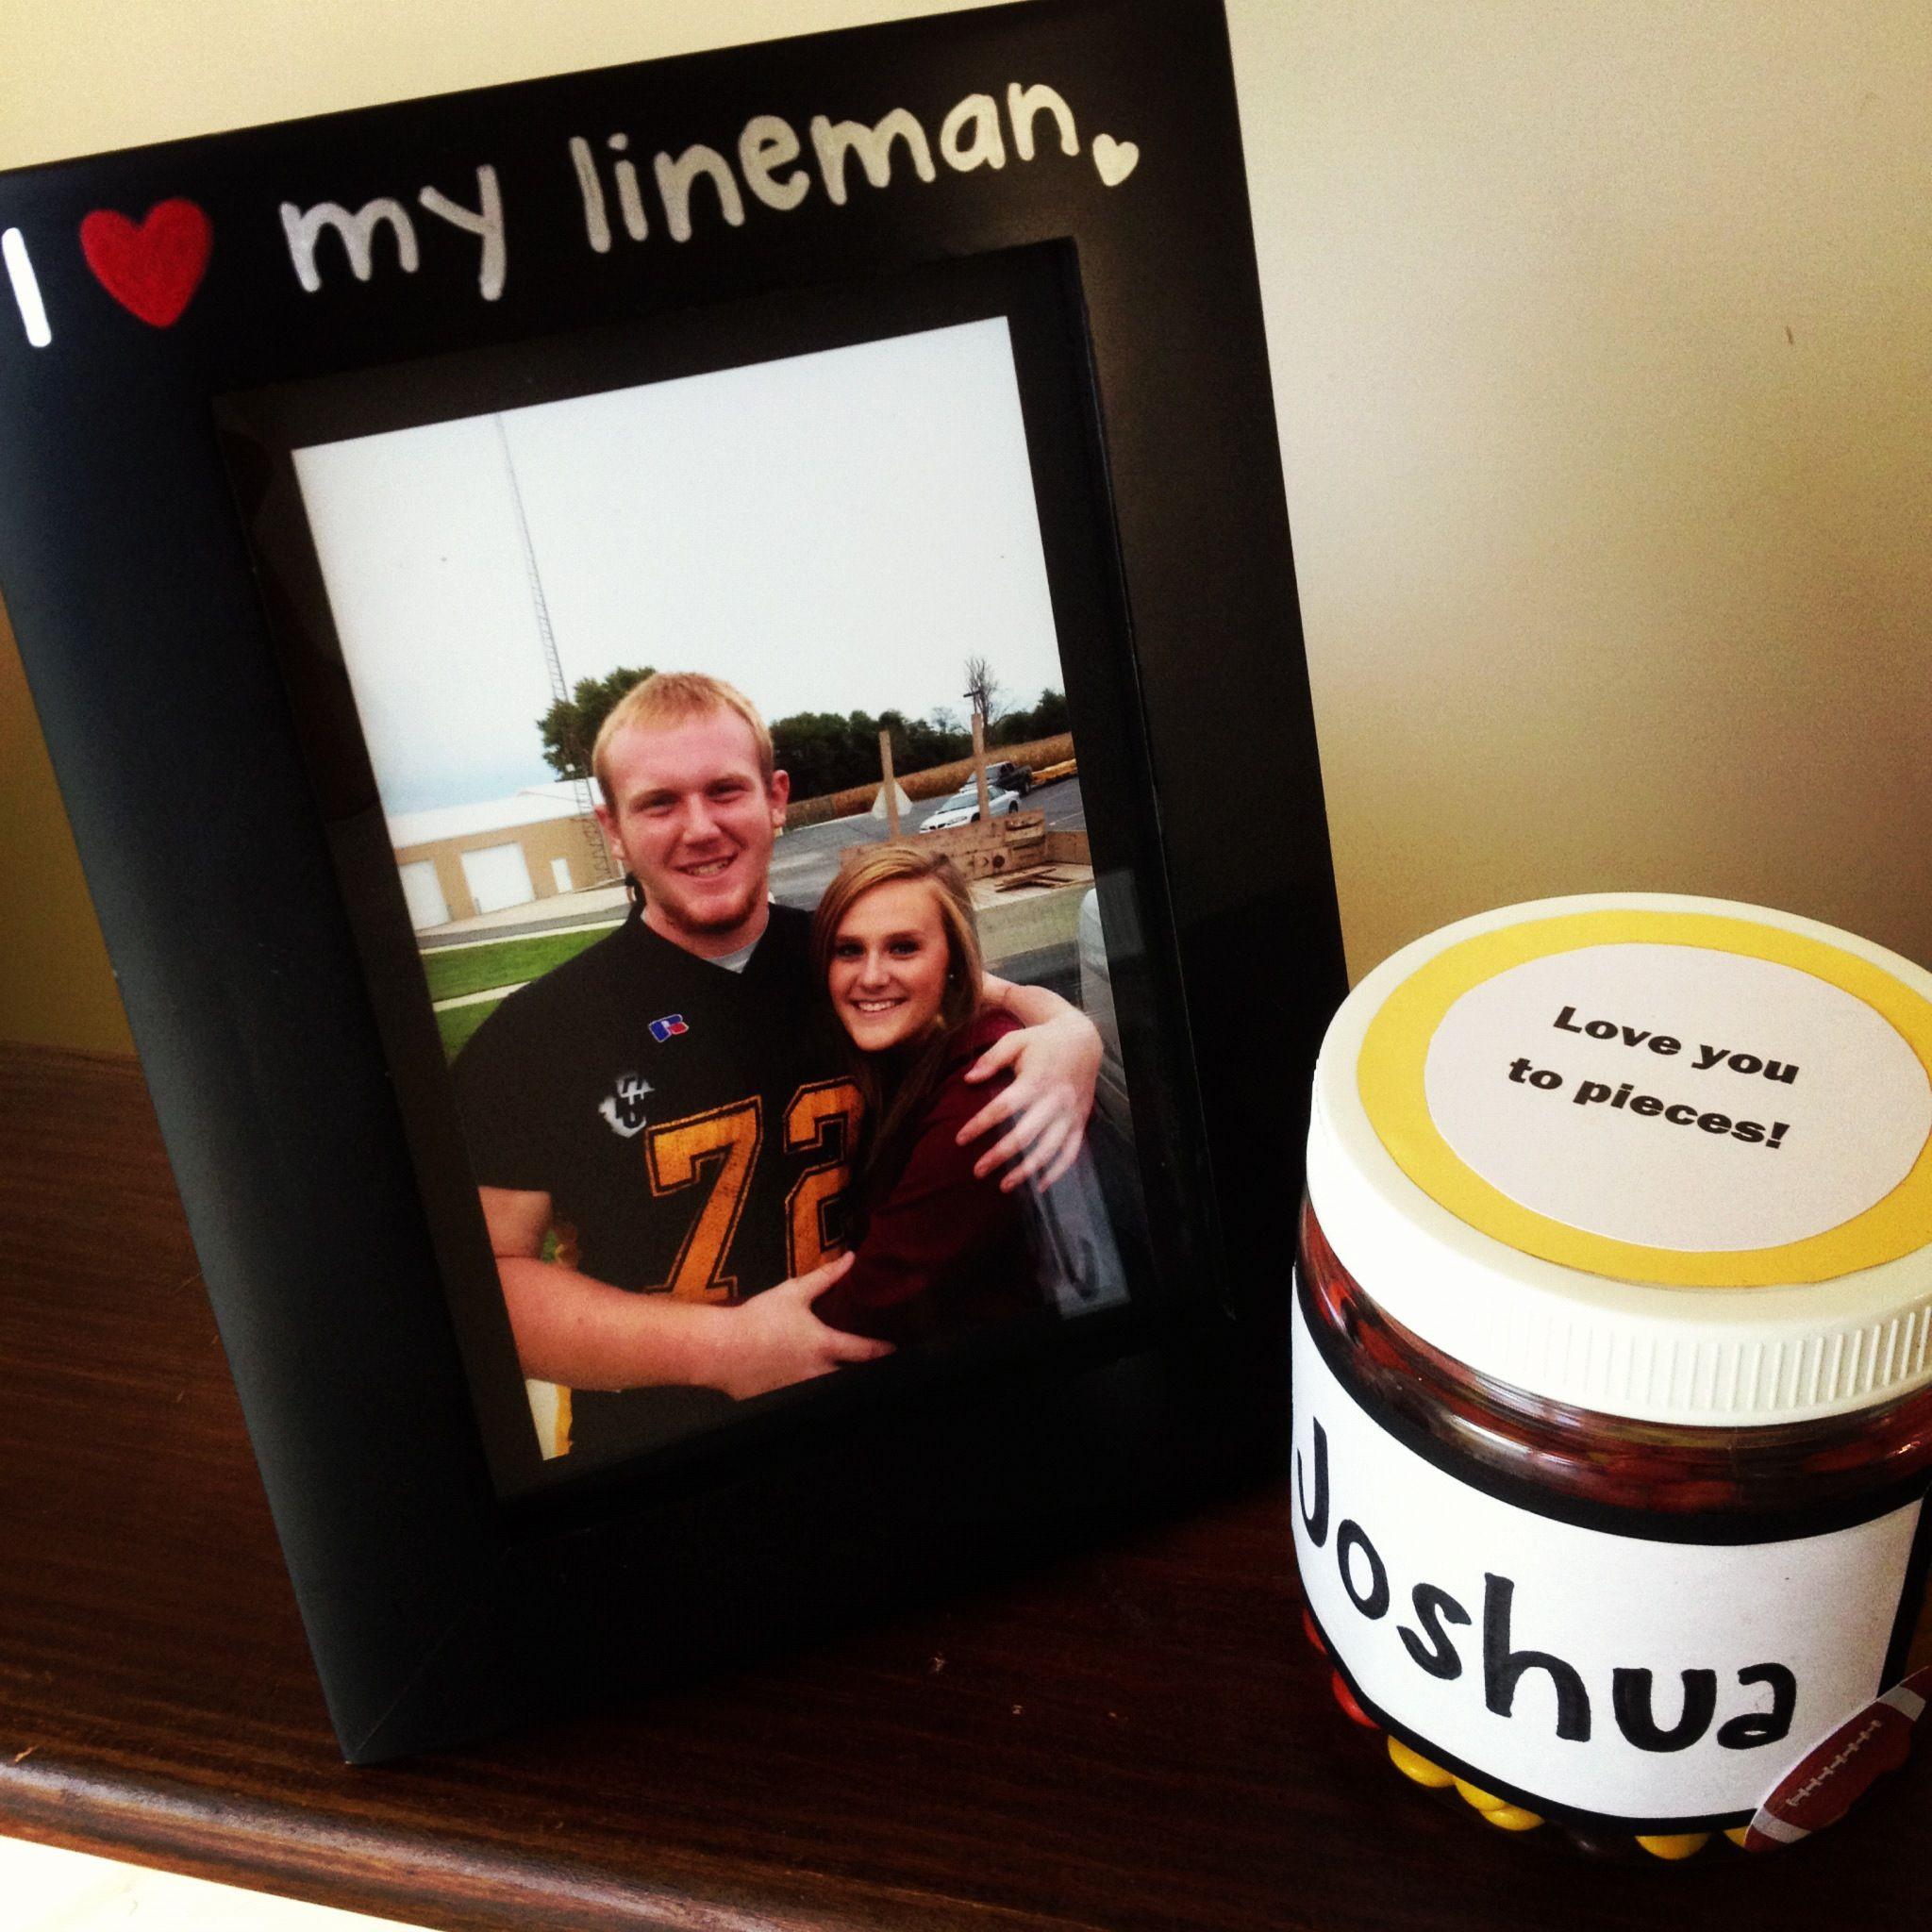 Football Gift Ideas For Boys  Gift for the boyfriend on his senior night for football